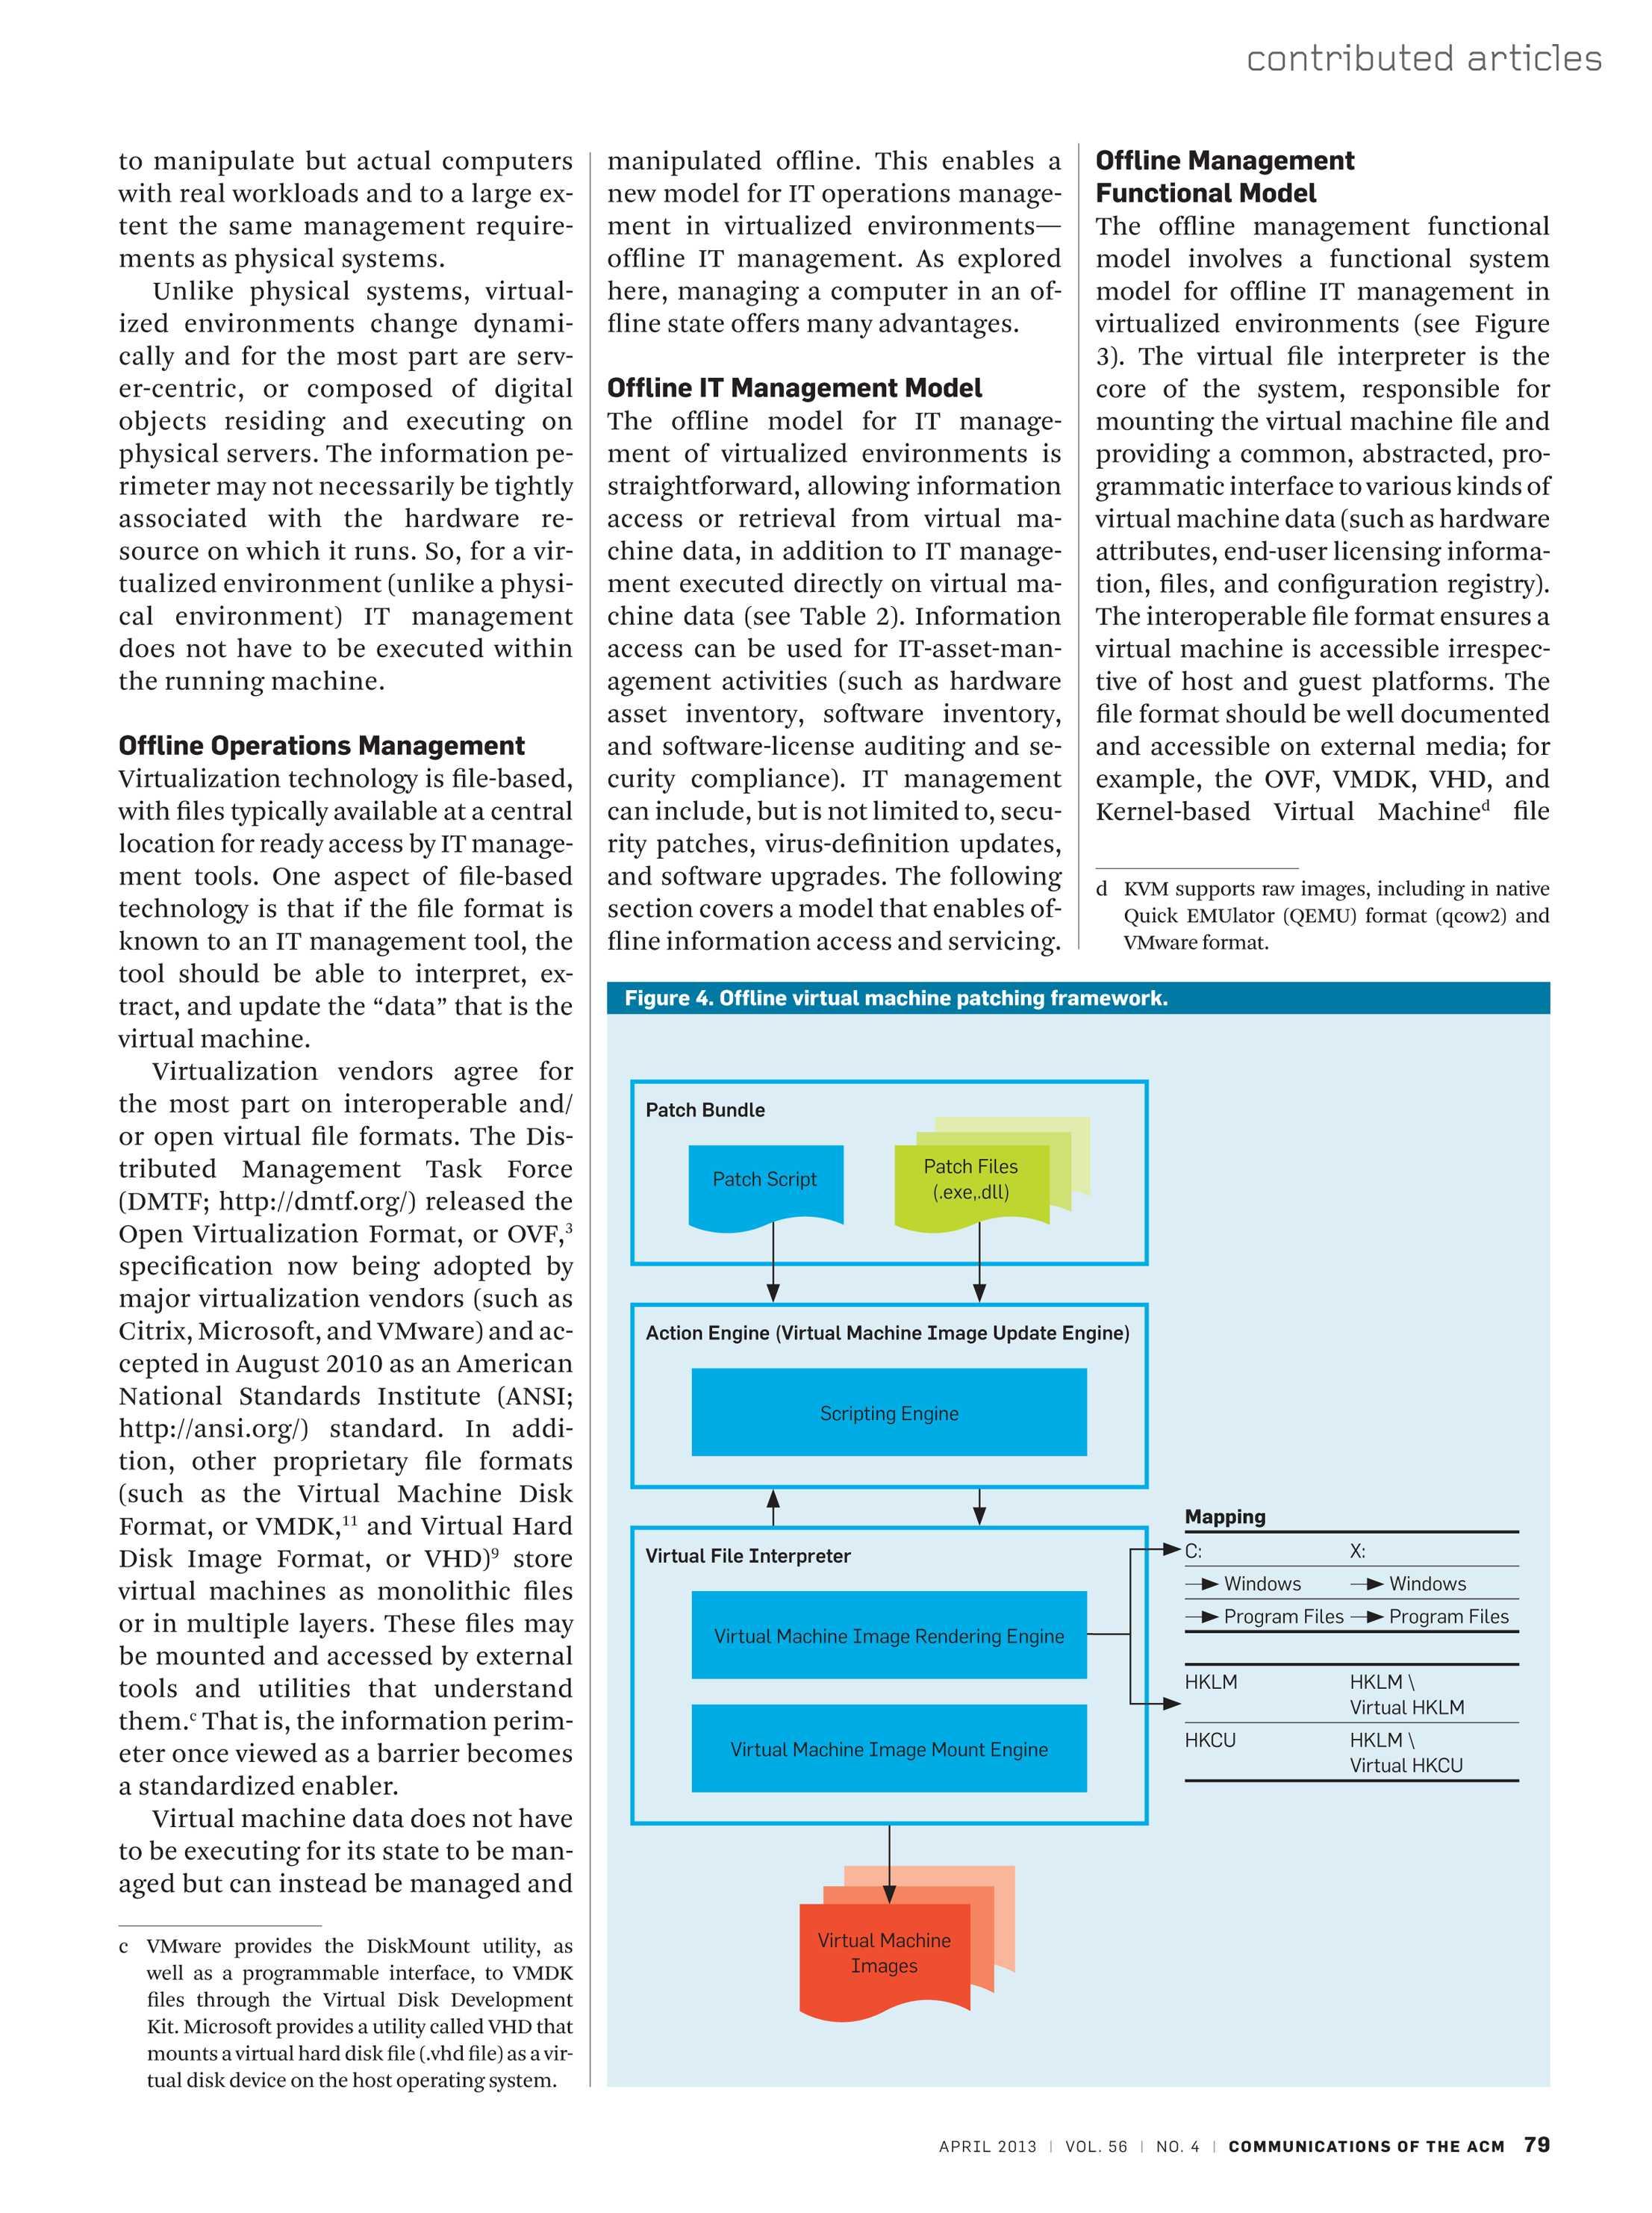 Communications - April 2013 - page 79